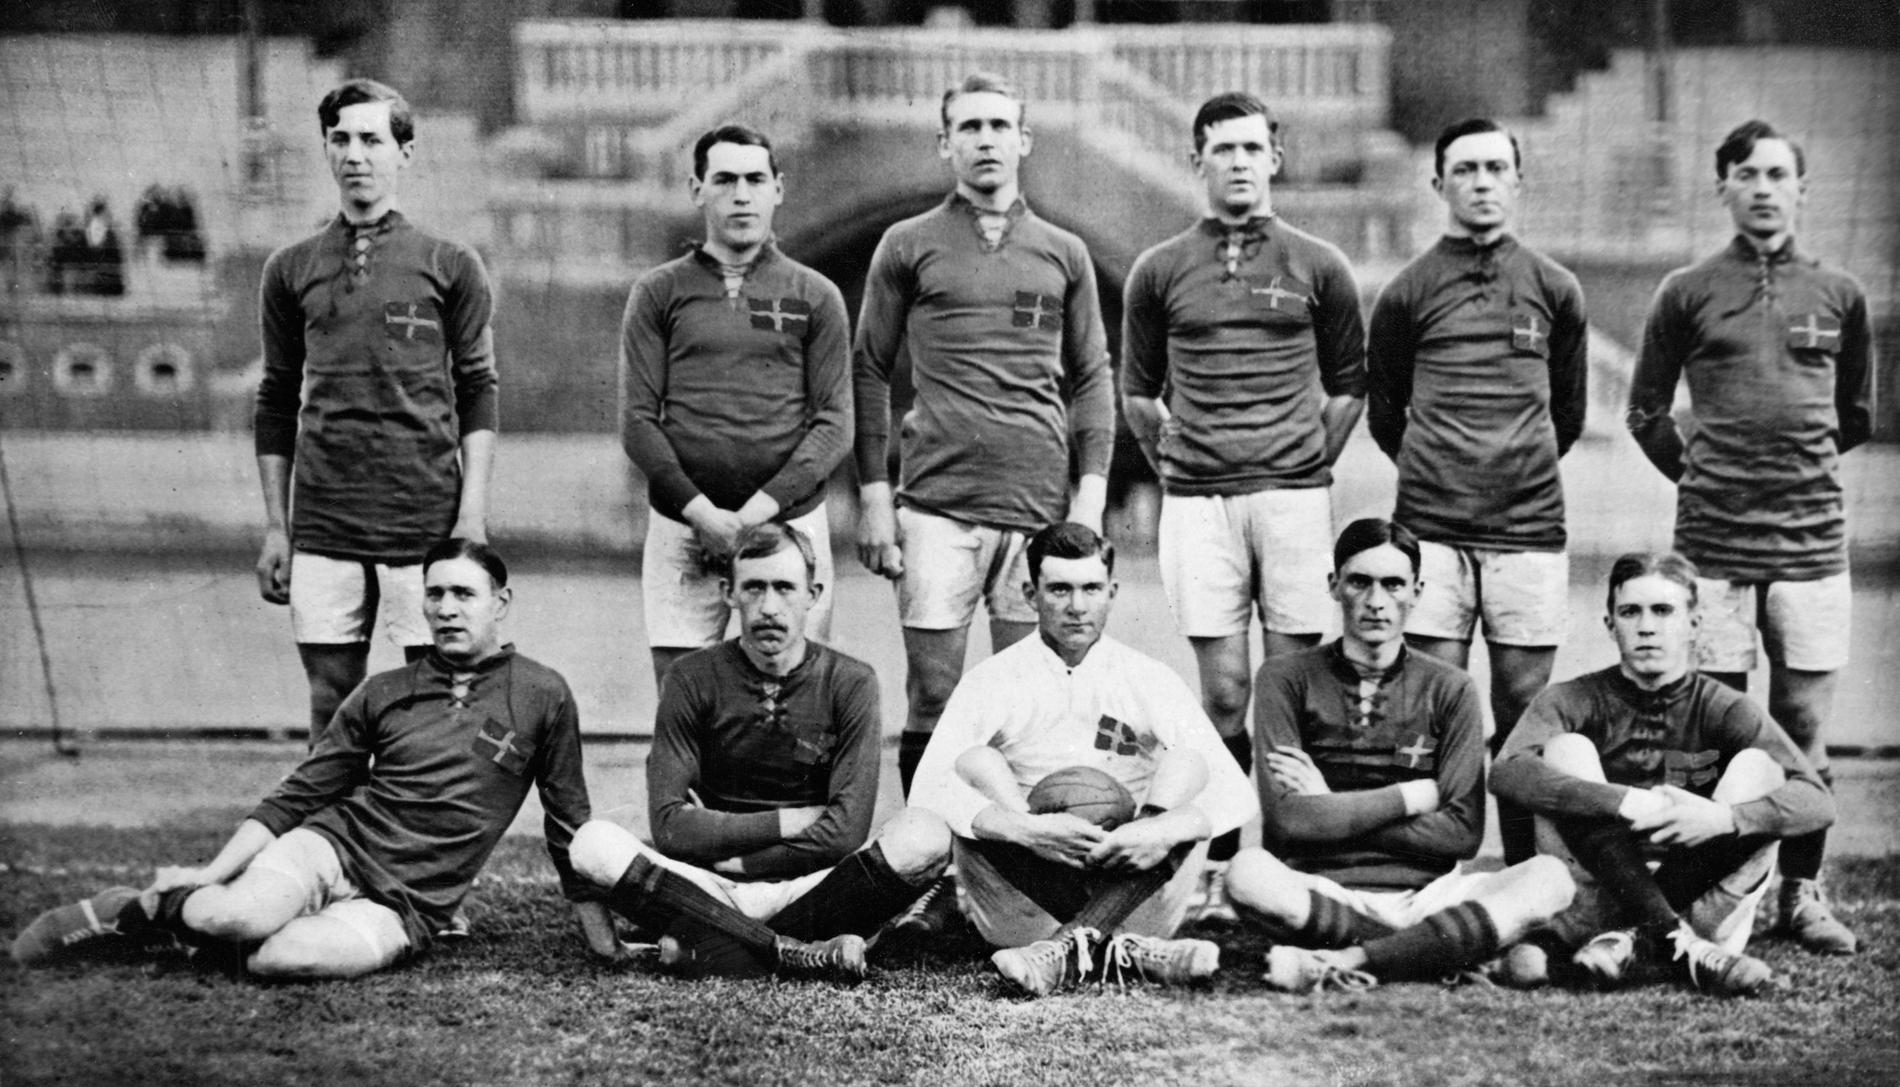 Svenska OS-laget 1912.